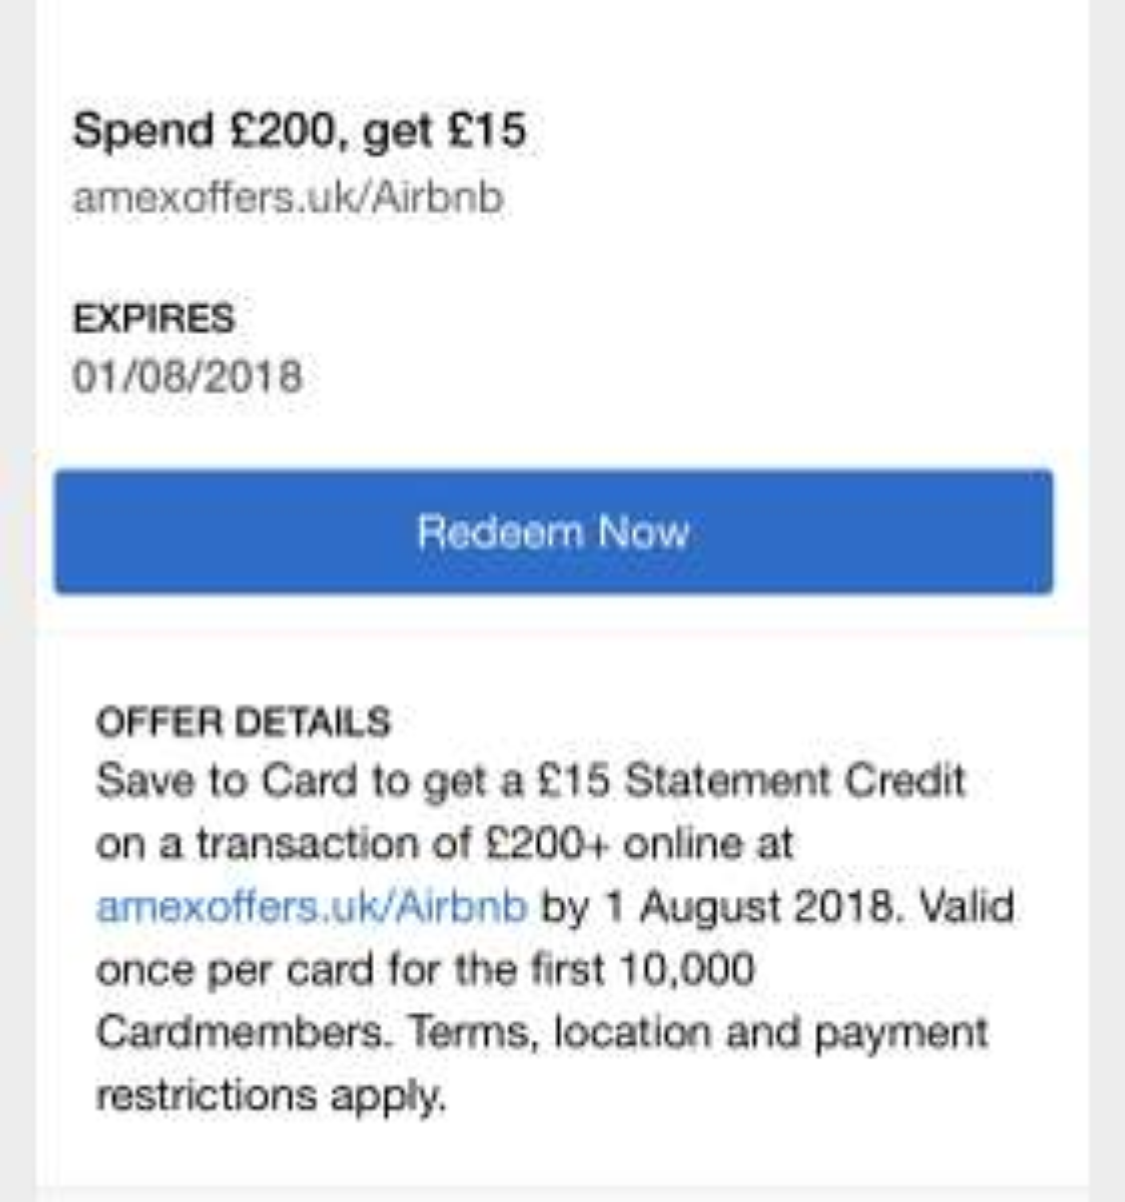 Amex Airbnb Offer - Spend £200, get £15 statement credit